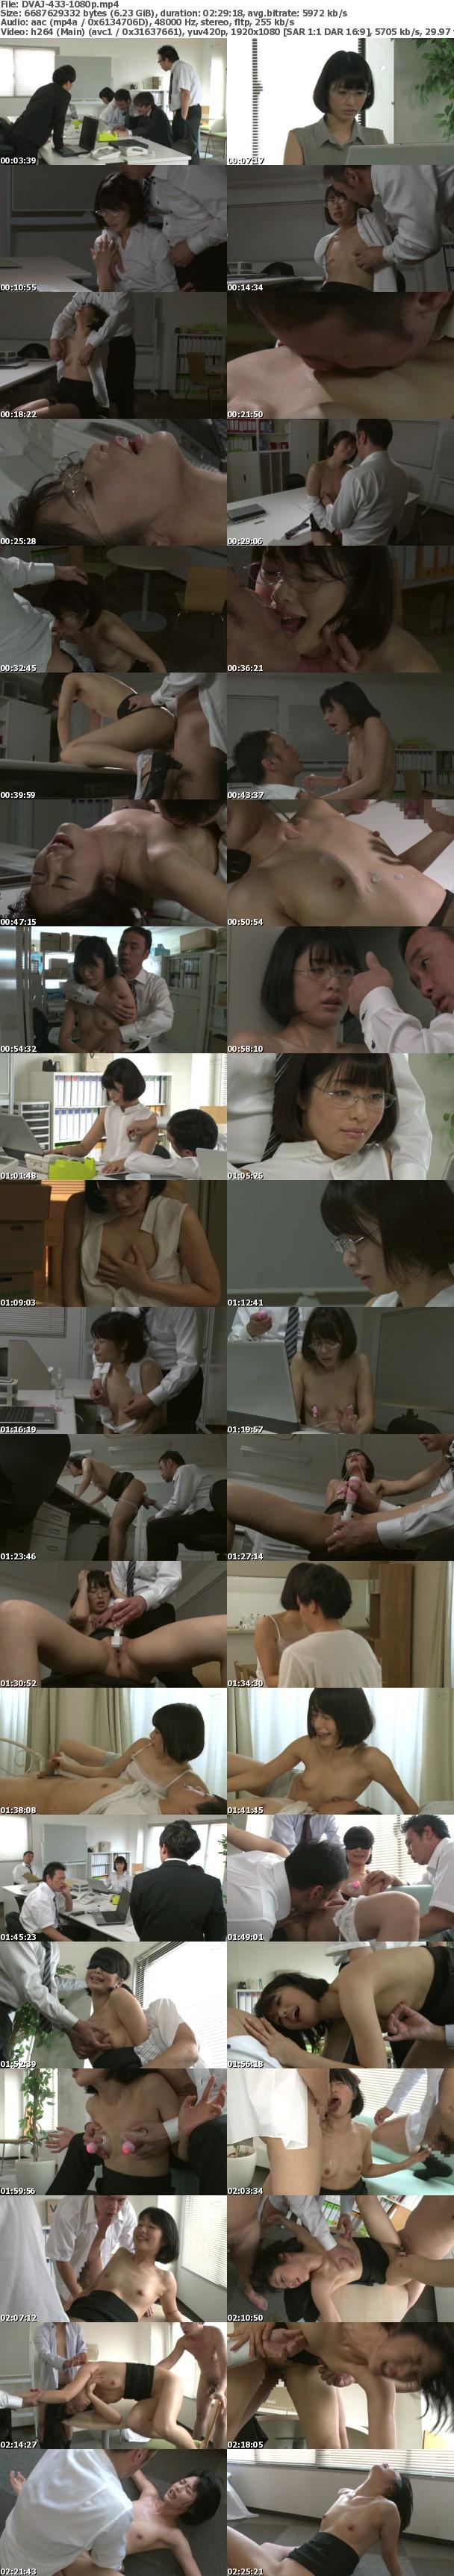 (Full HD) DVAJ-433 上司に乳首ハラスメントされ続け、早漏イクイク敏感体質に仕込まれた女子社員 川上奈々美